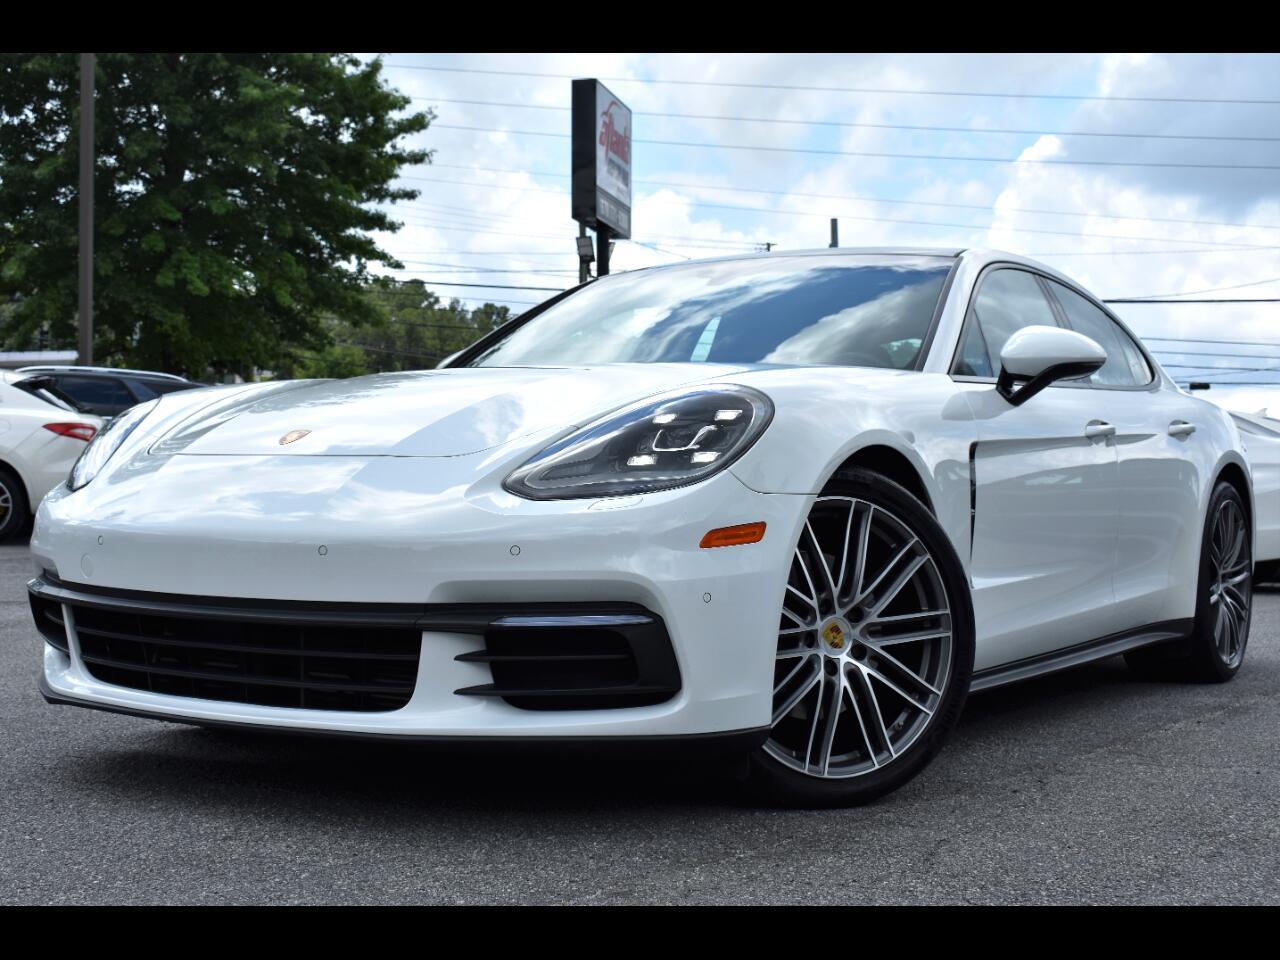 Porsche Panamera 4 4D Sedan 2018